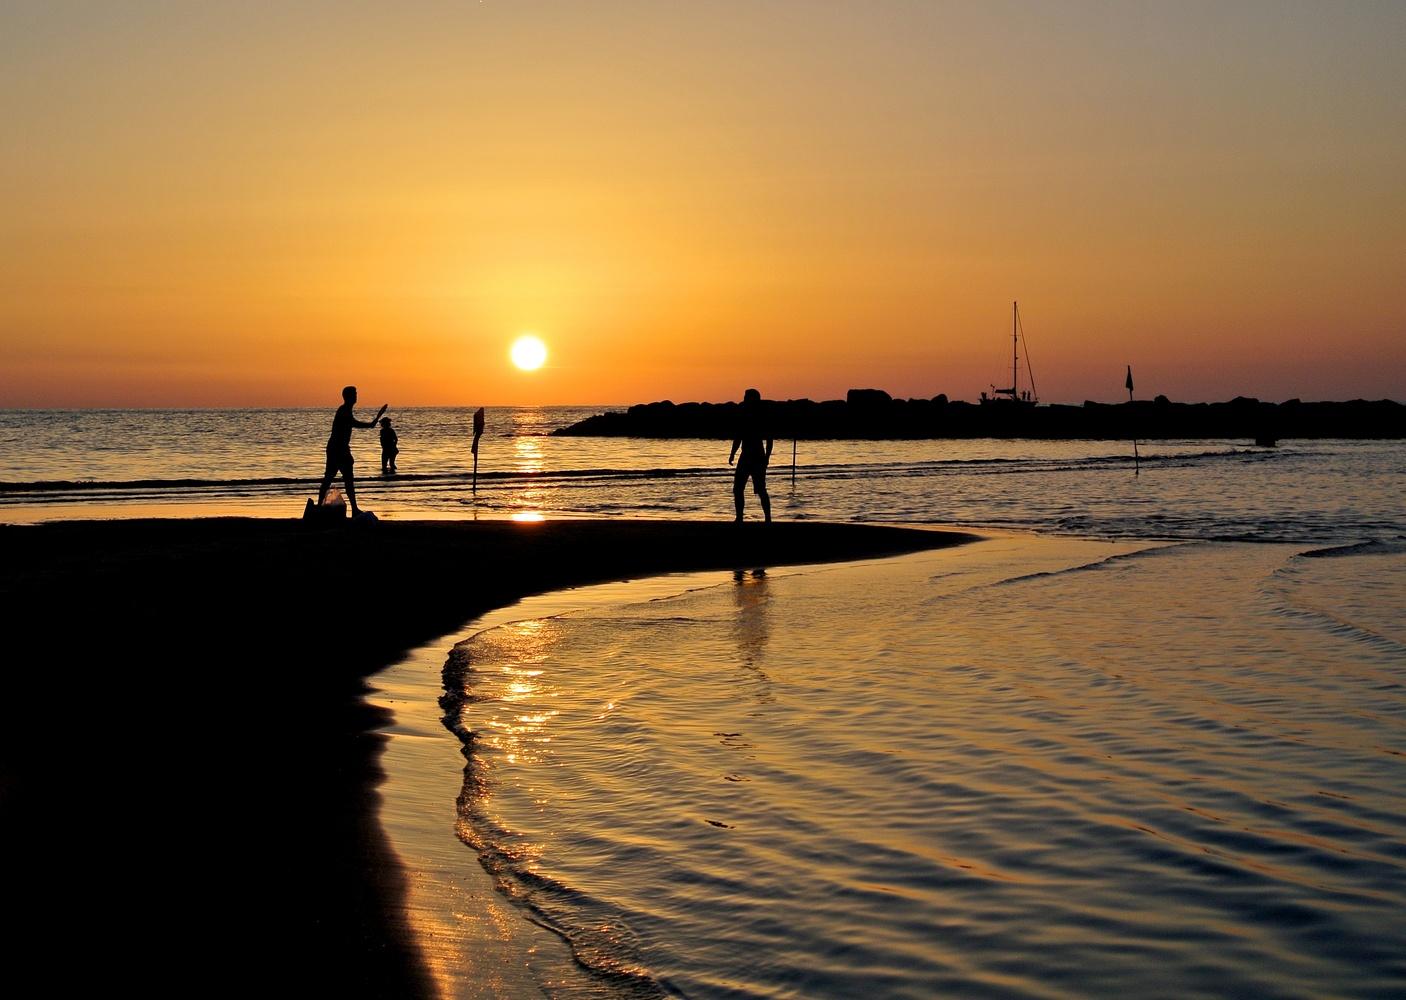 Tel Aviv sunset by Marian Pollock